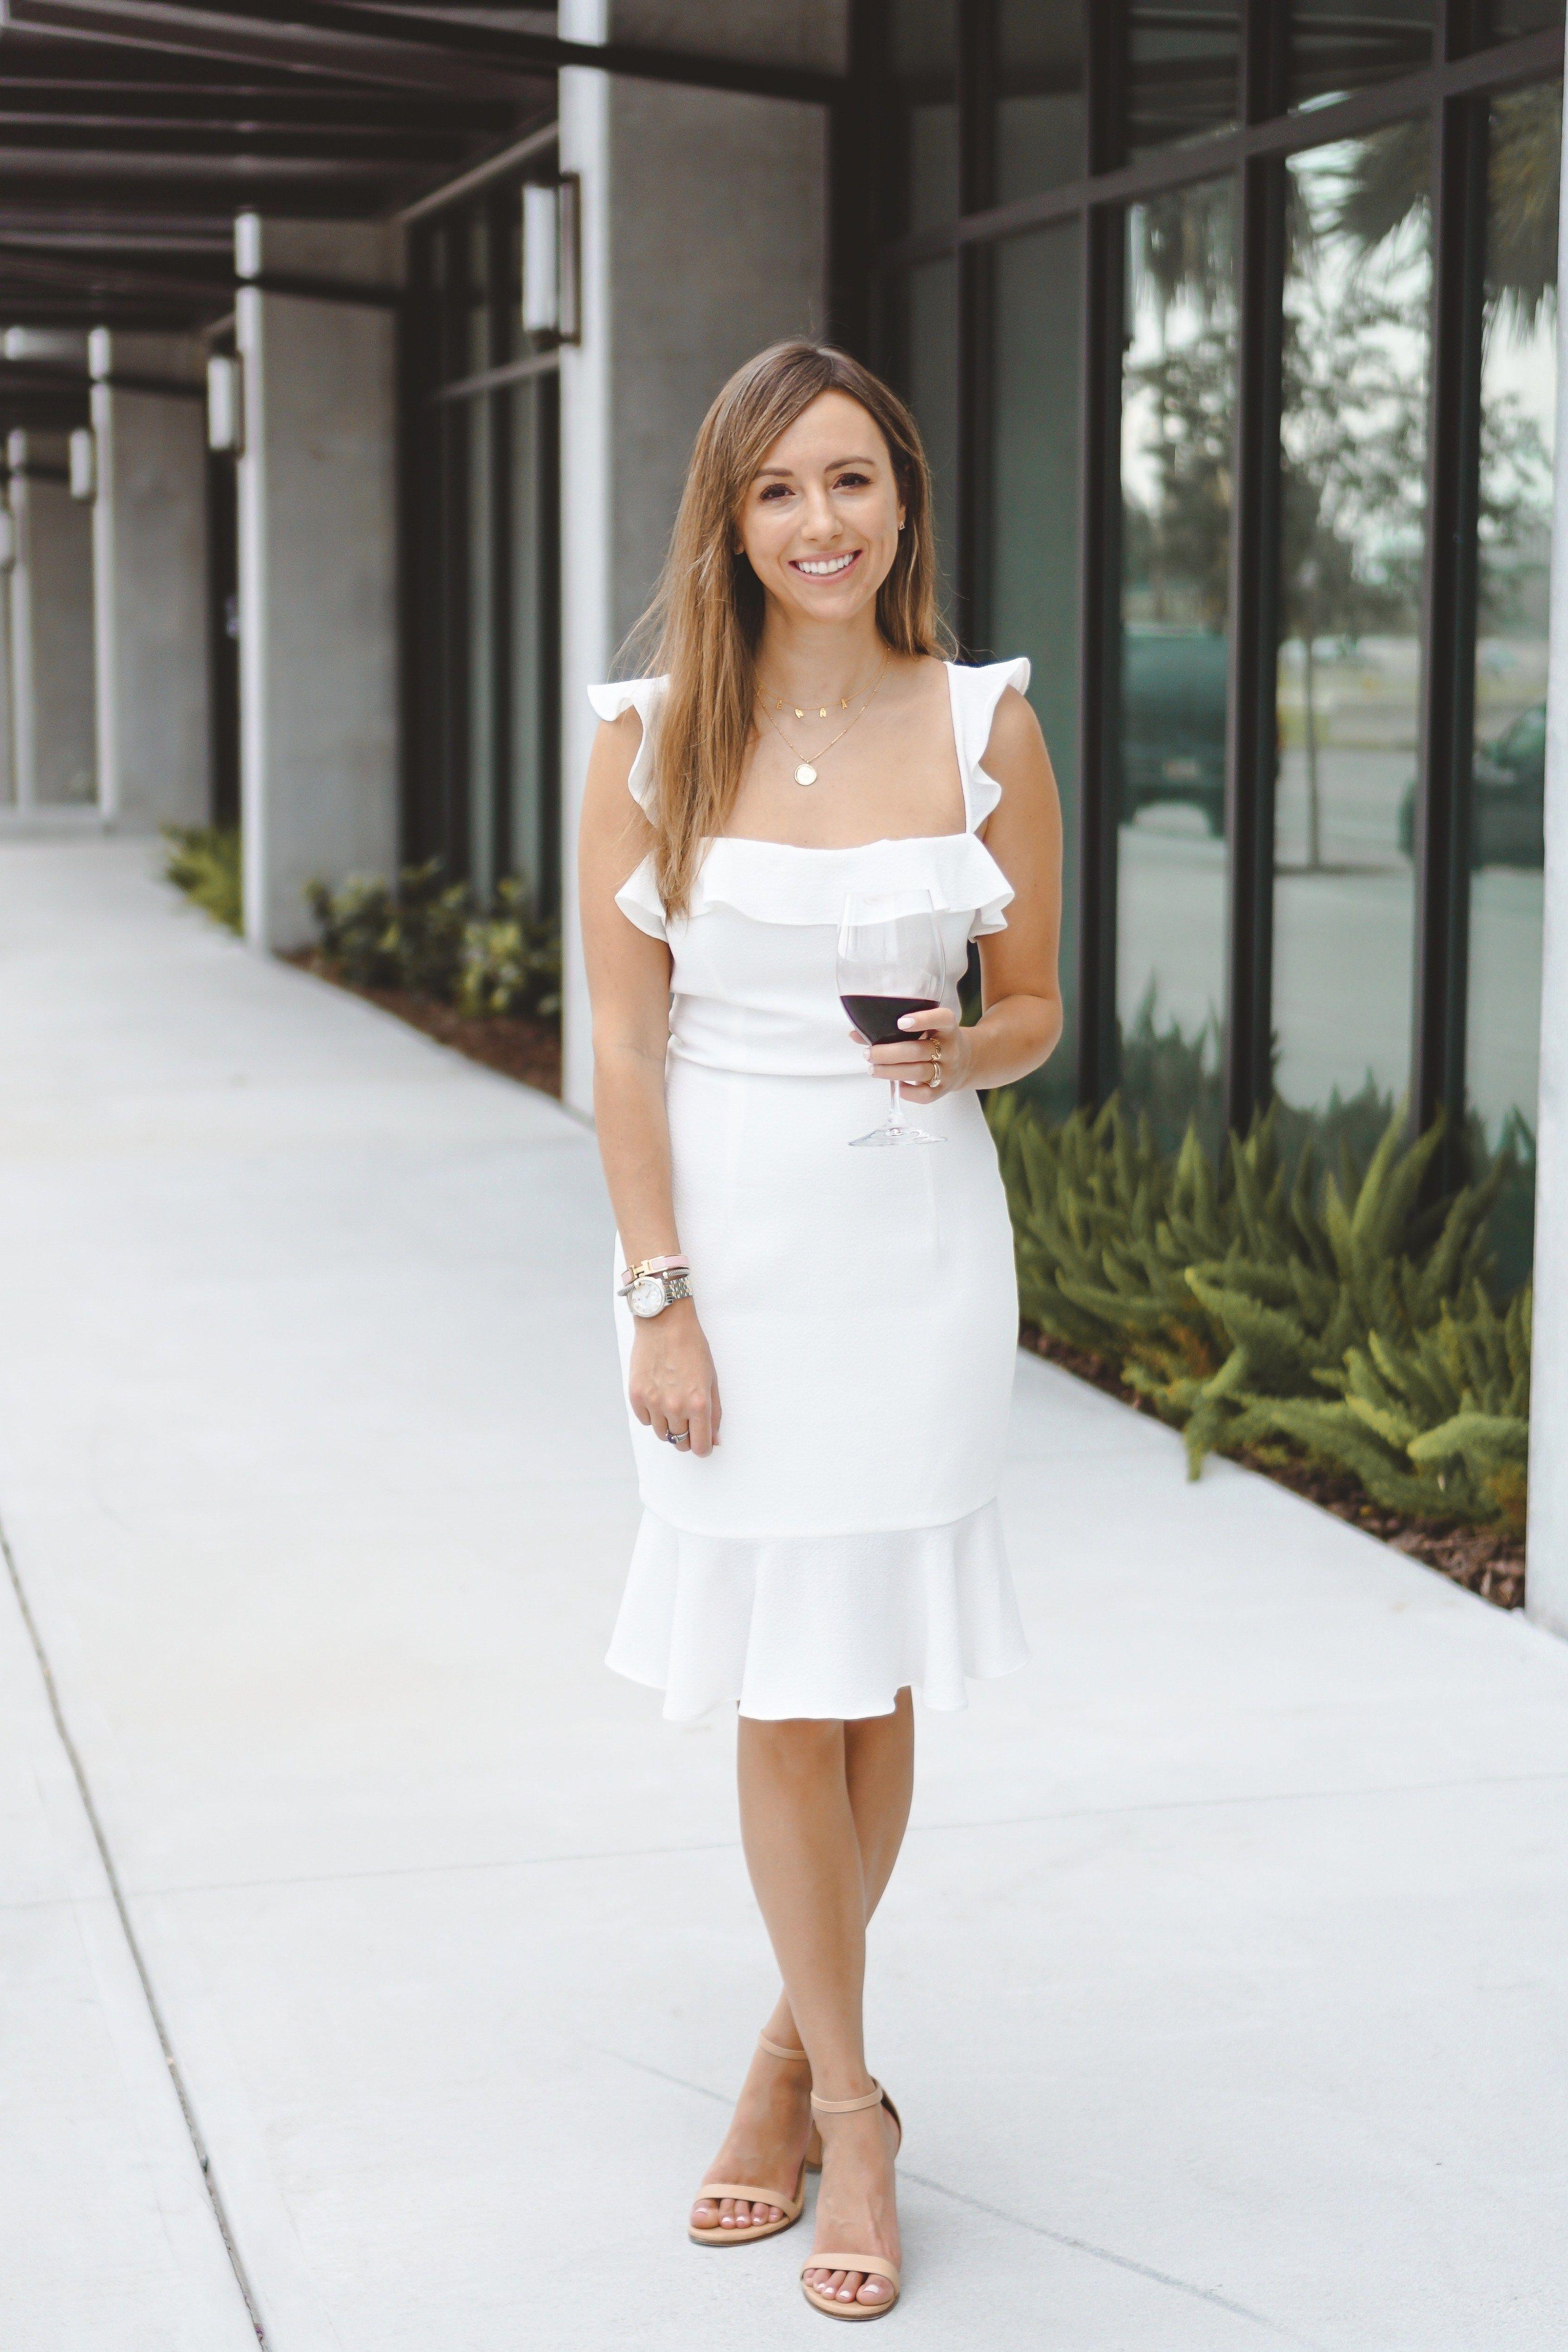 Dresses For Summer 2019 Styledjen Dresses Summer Dresses London Fashion Bloggers [ 4950 x 3300 Pixel ]